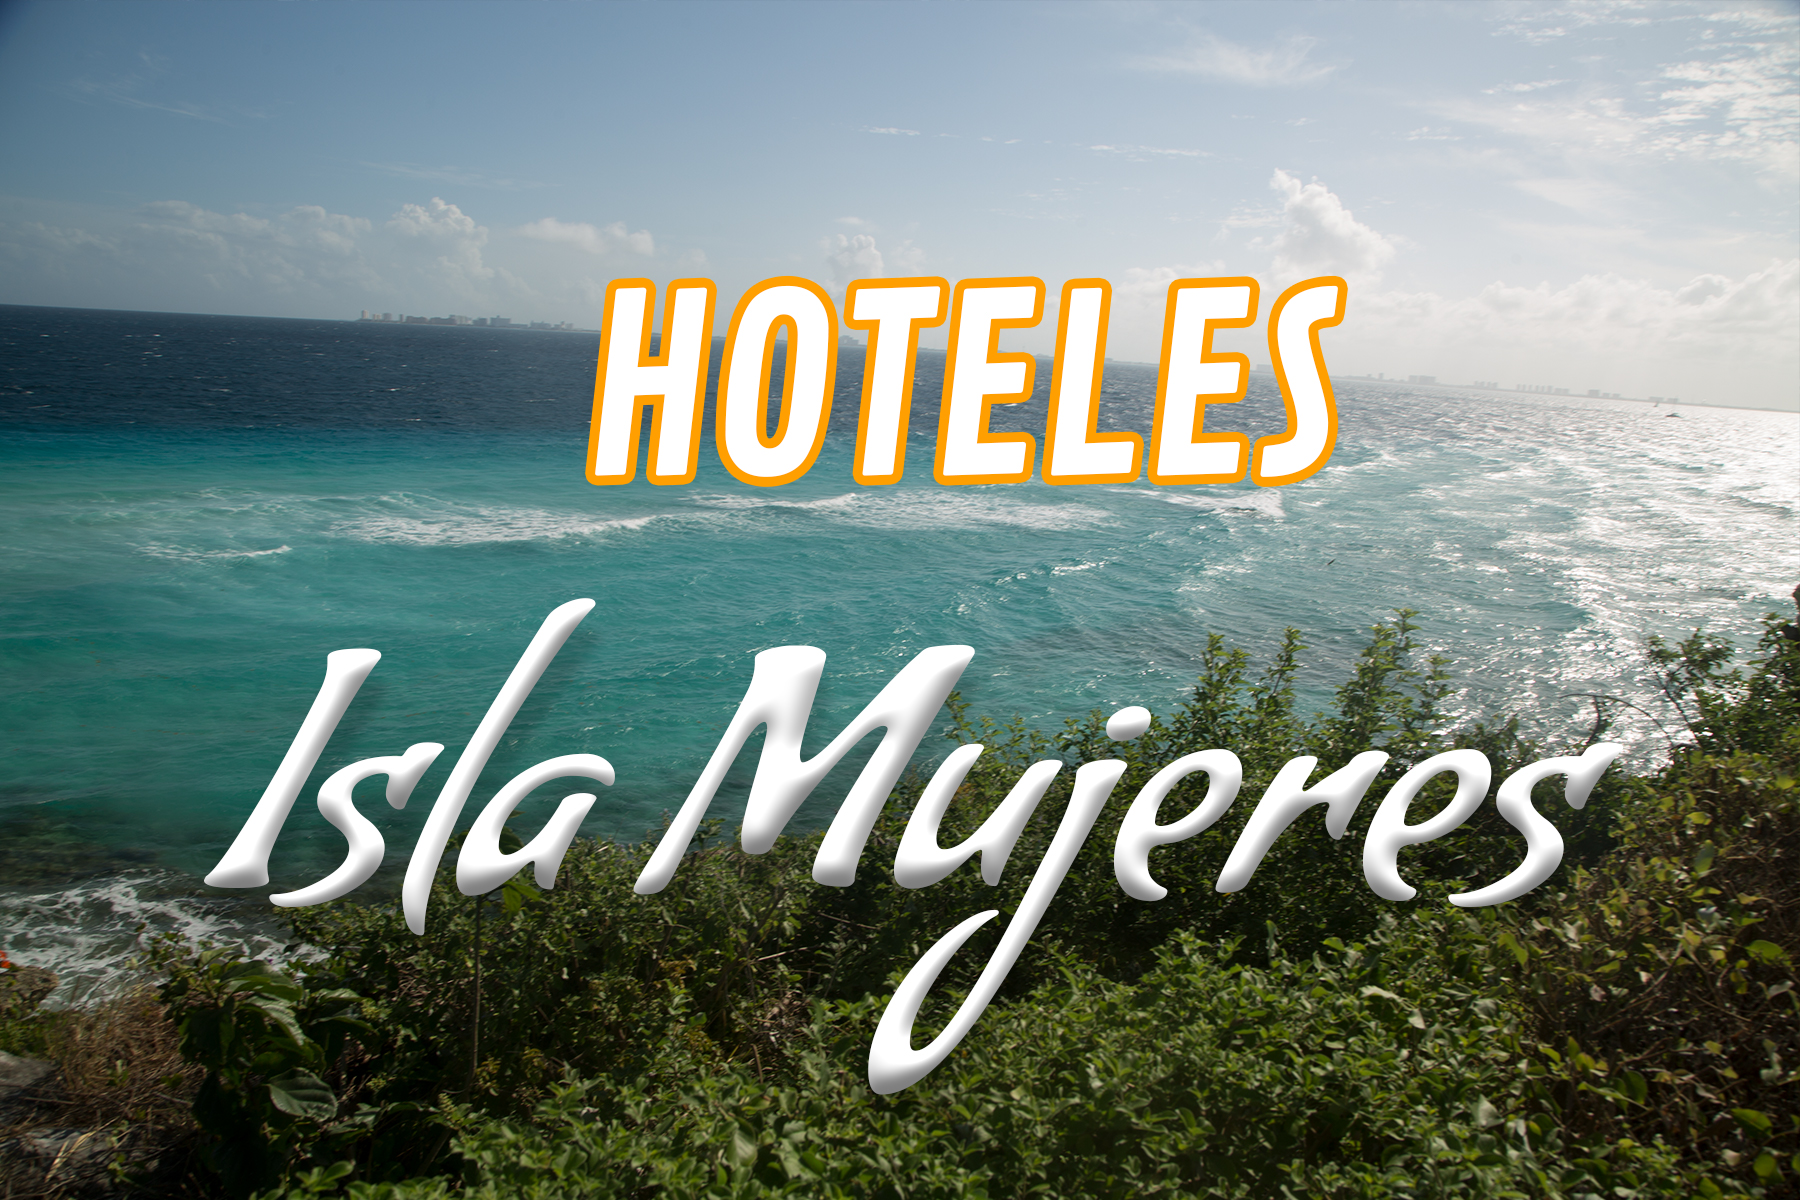 Top 10 Hoteles en Isla Mujeres